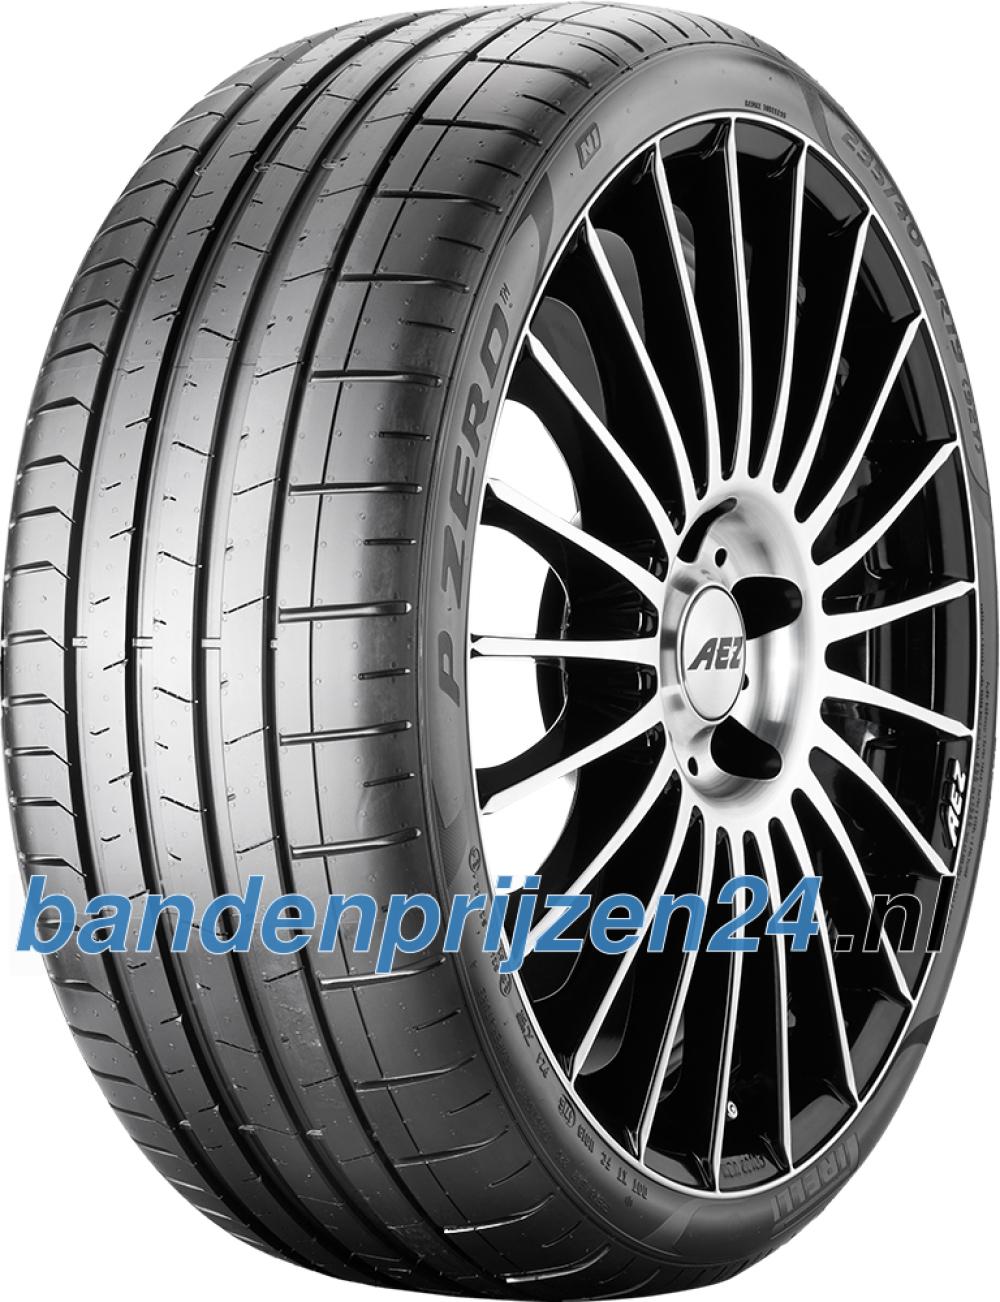 Pirelli P Zero SC ( 295/30 ZR20 (101Y) XL MO1 )